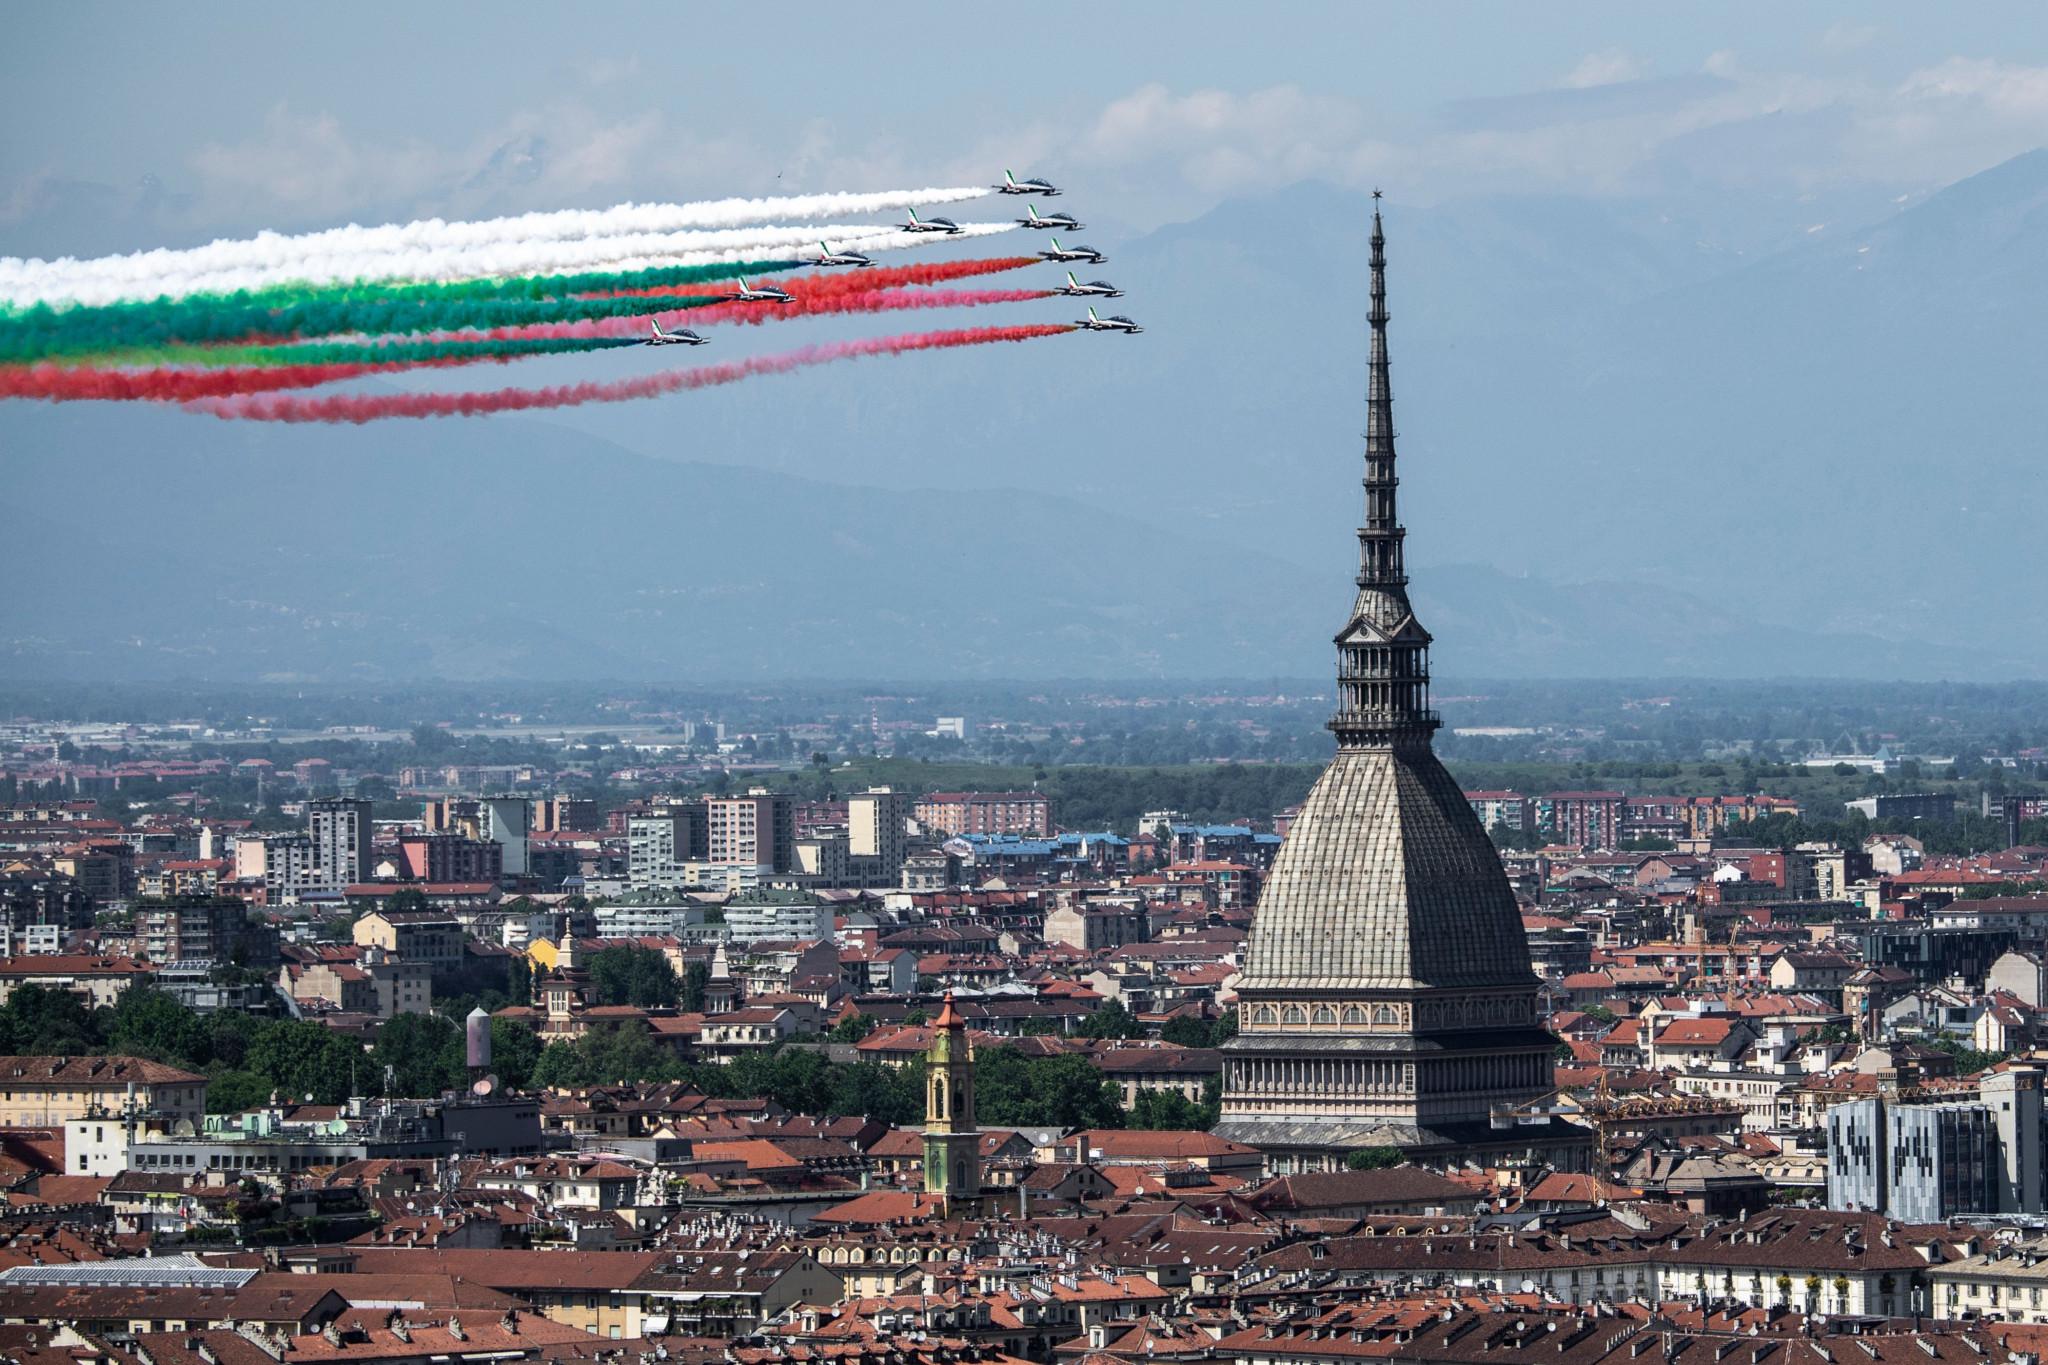 Winter Olympics rival host city Turin beats Milan to Eurovision 2022 rights